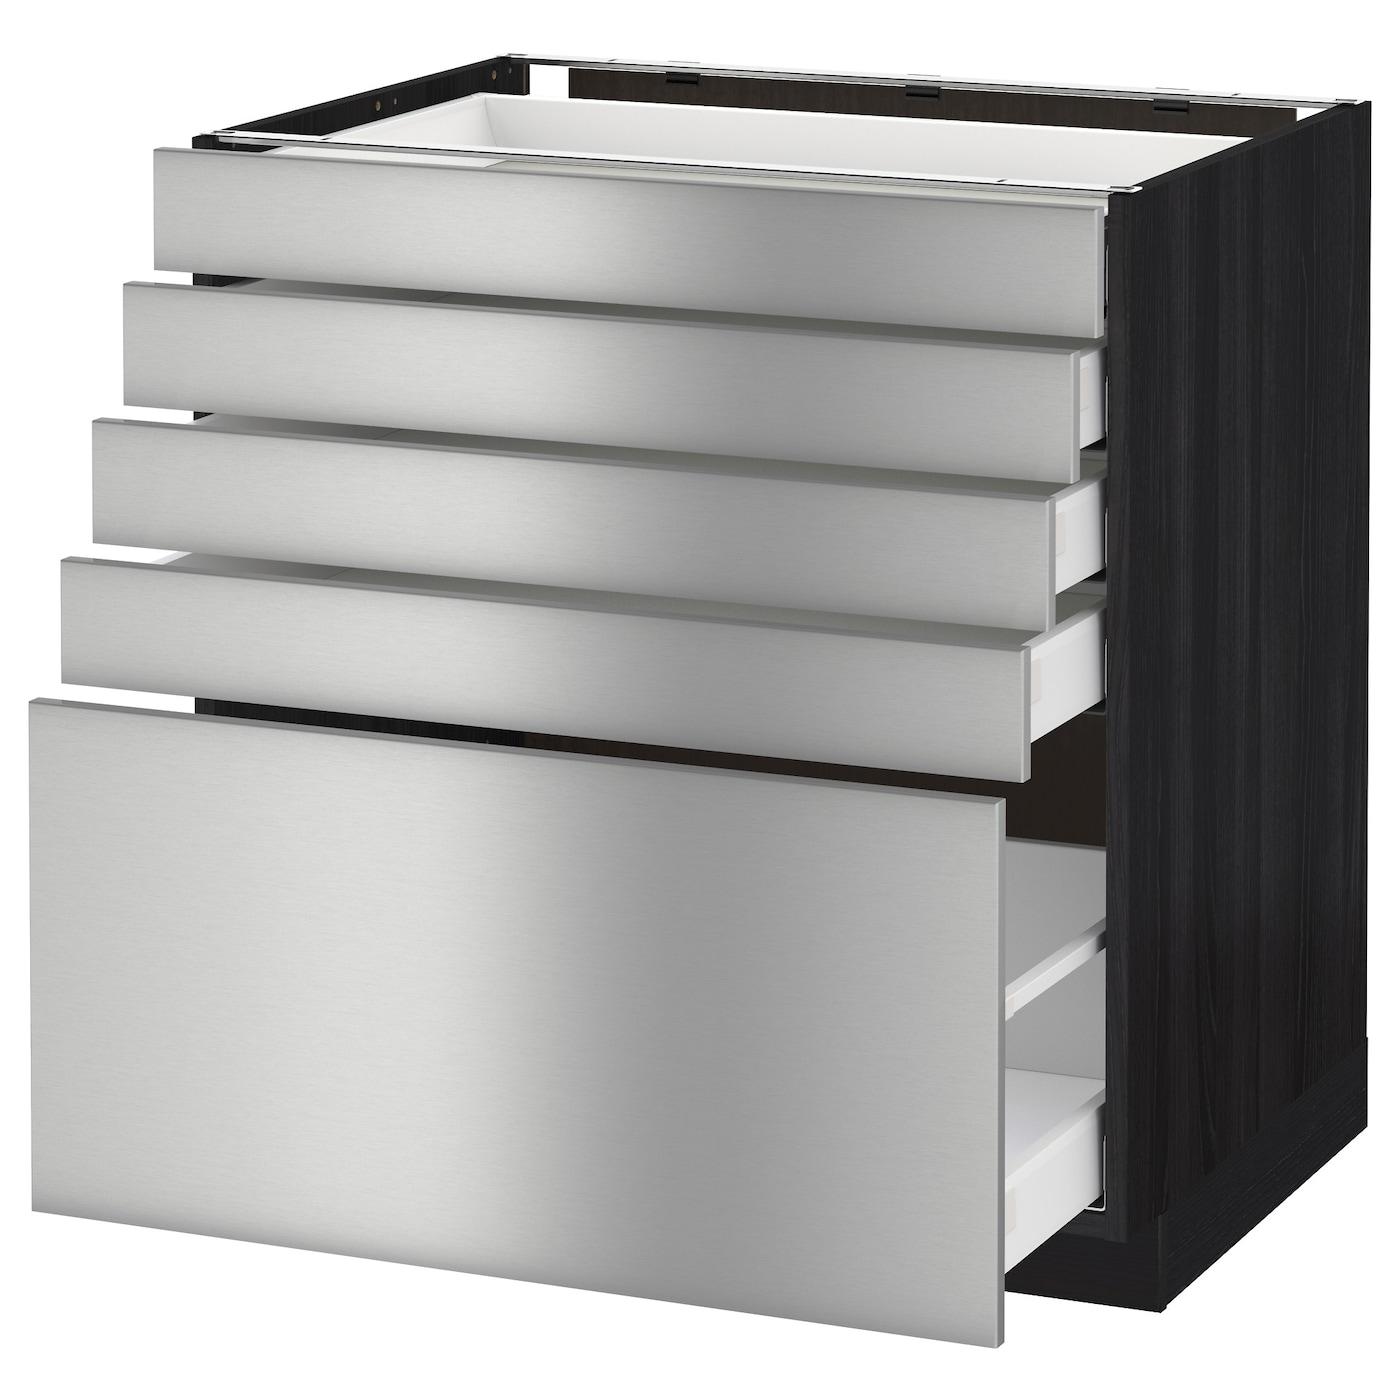 metod maximera base cabinet with 5 drawers black grevsta stainless steel 80x60 cm ikea. Black Bedroom Furniture Sets. Home Design Ideas